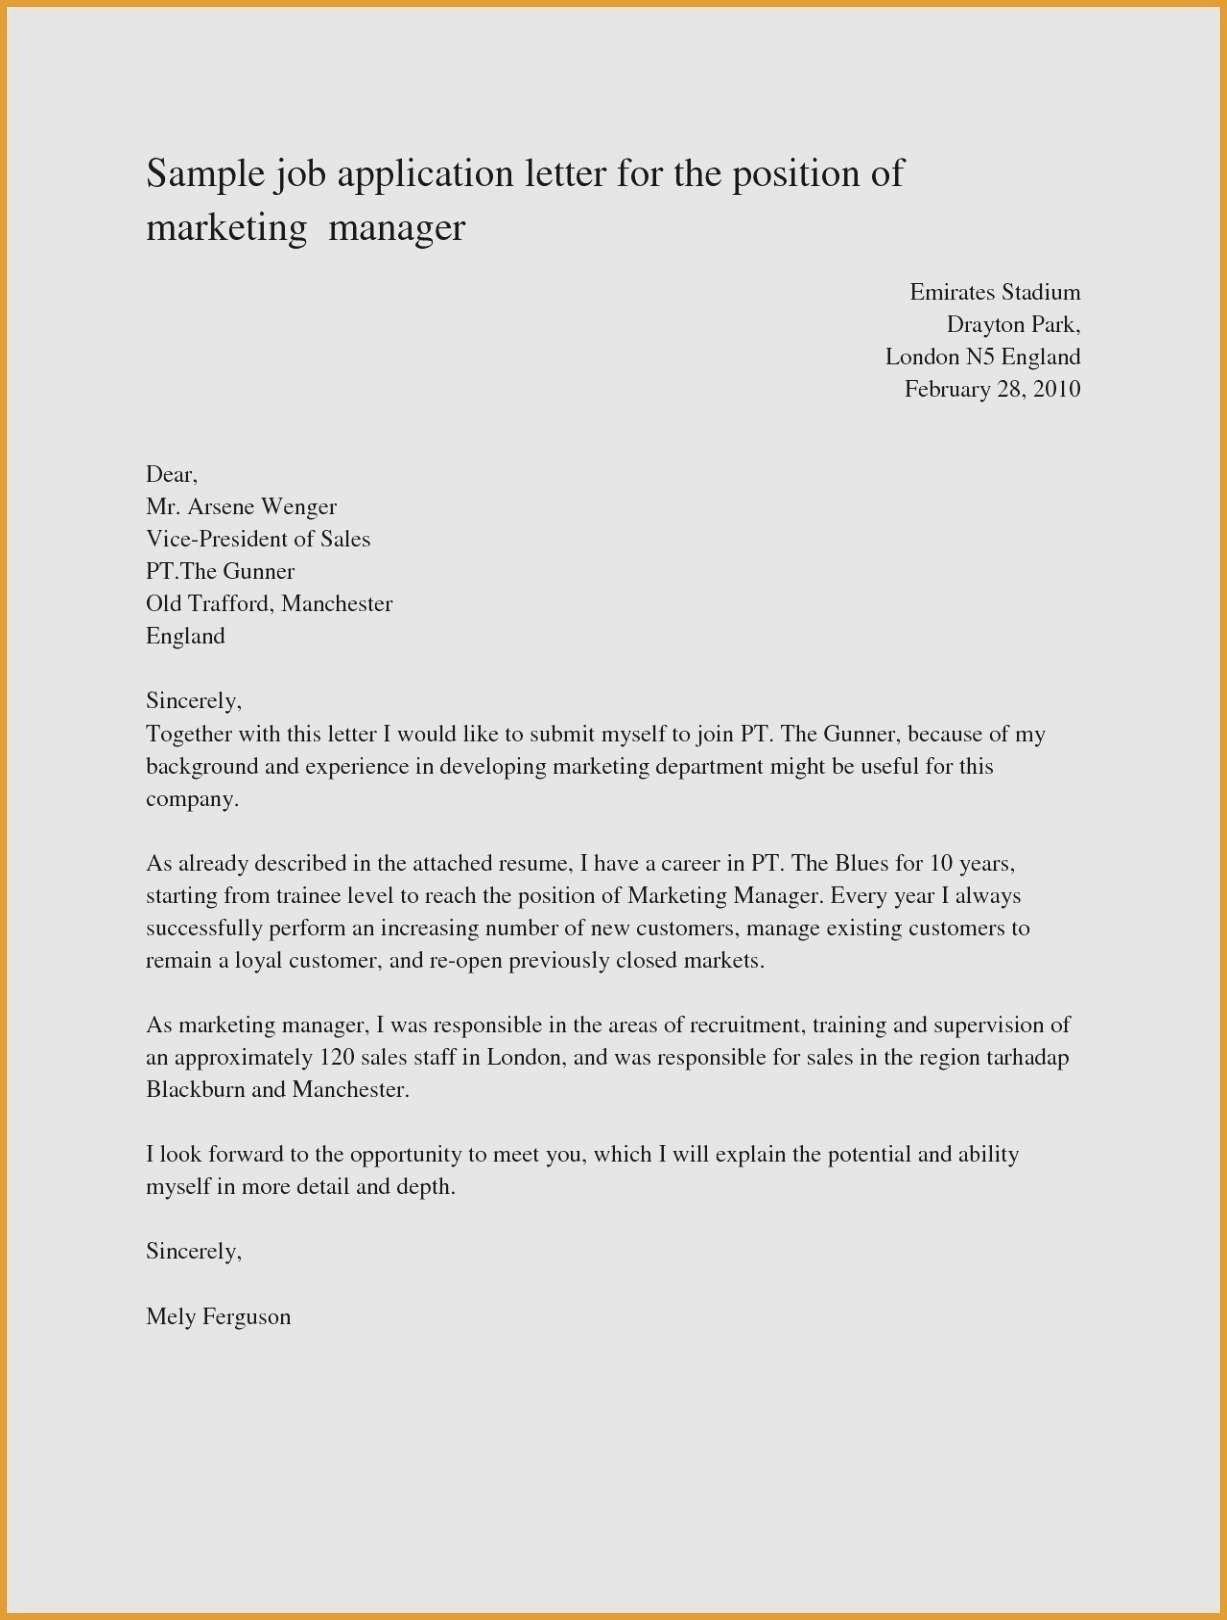 Unique Application Letter for Job Vacancy Sample